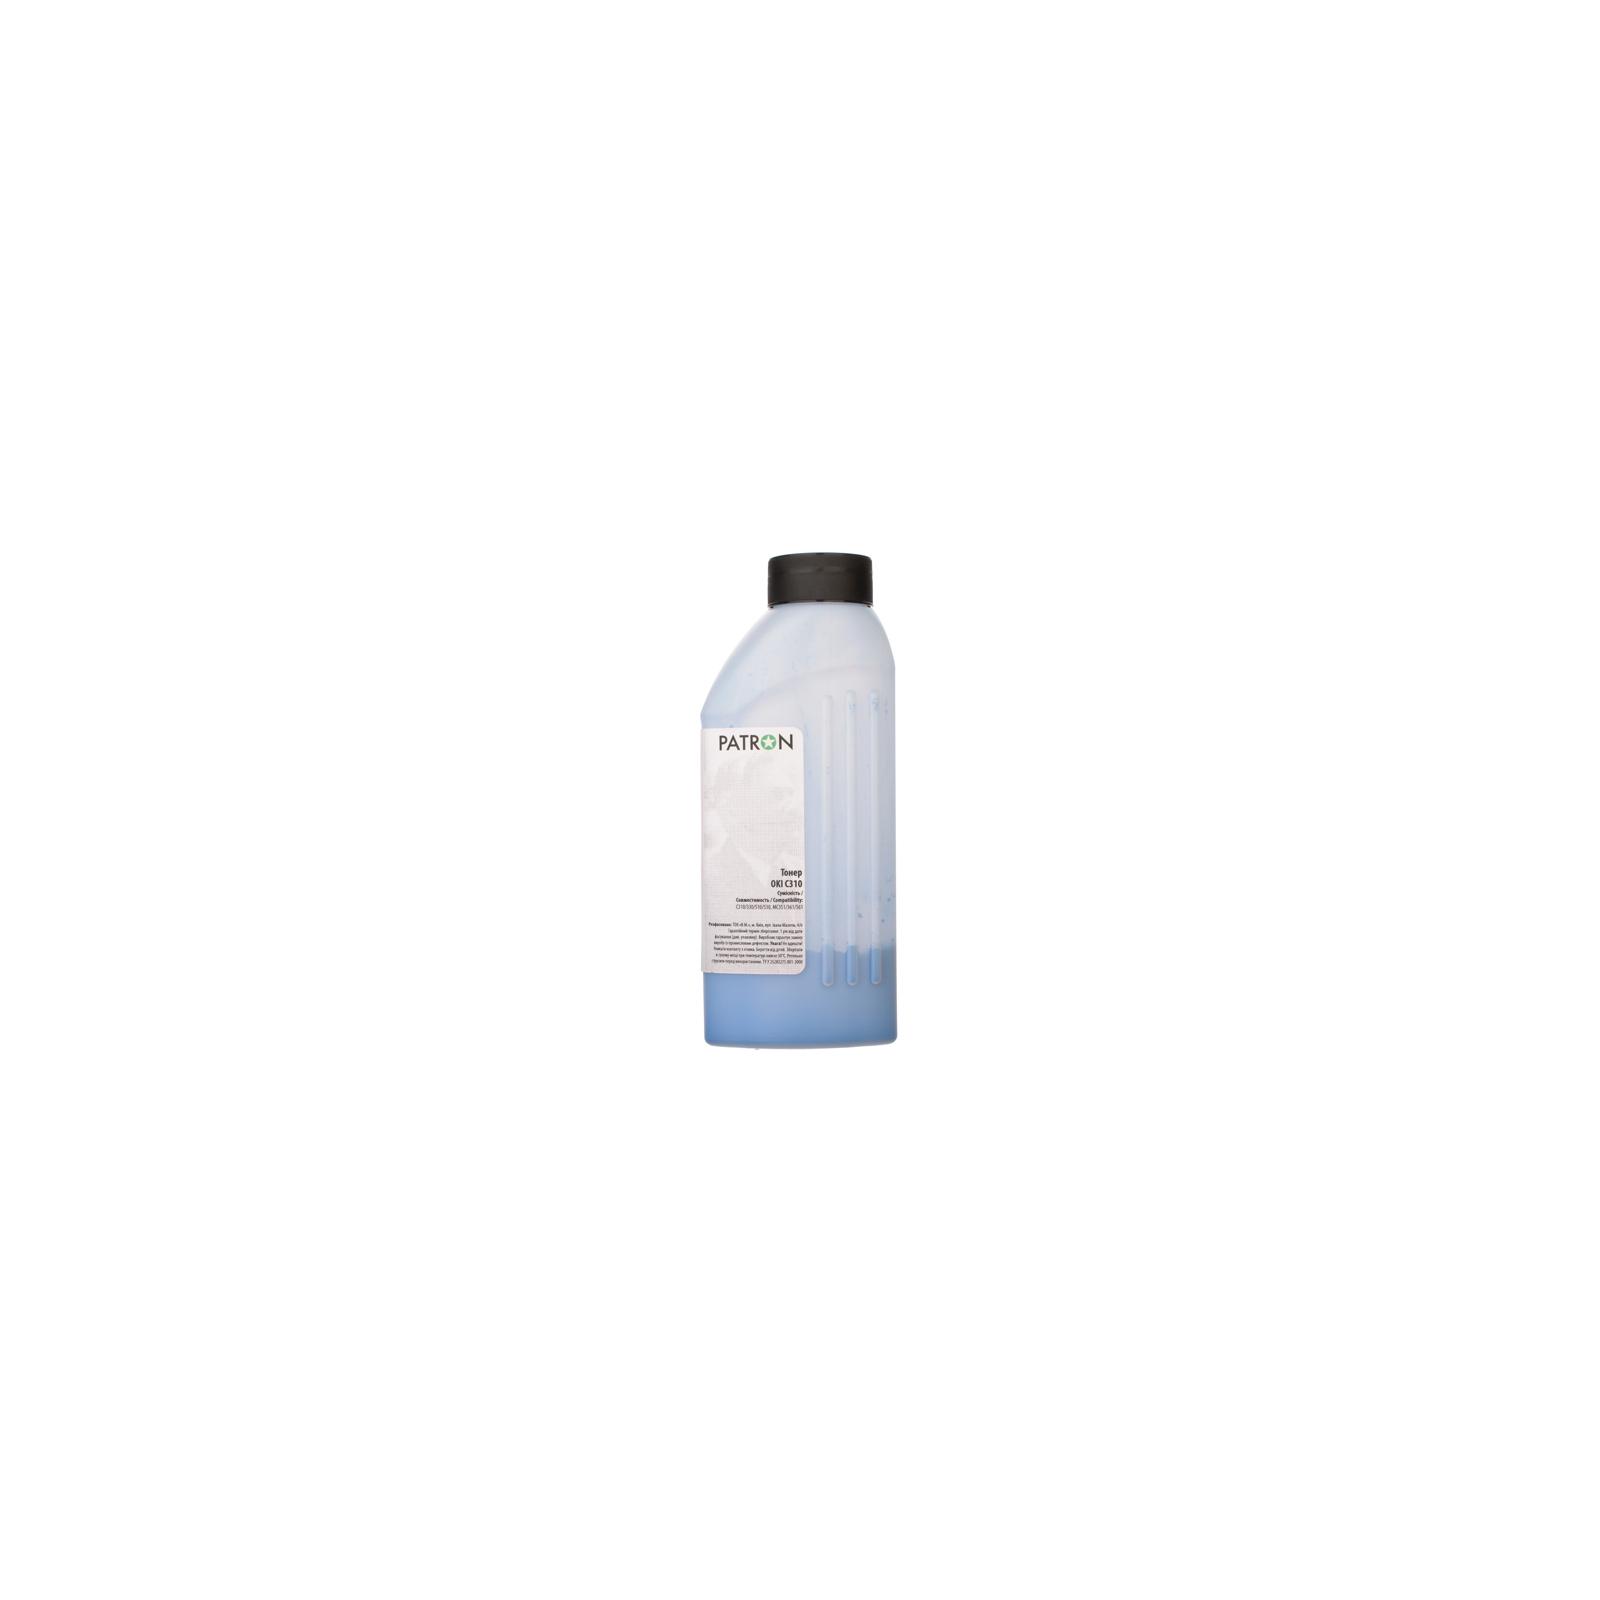 Тонер PATRON OKI C310 CYAN 50г (T-PN-OC310-C-050) изображение 2